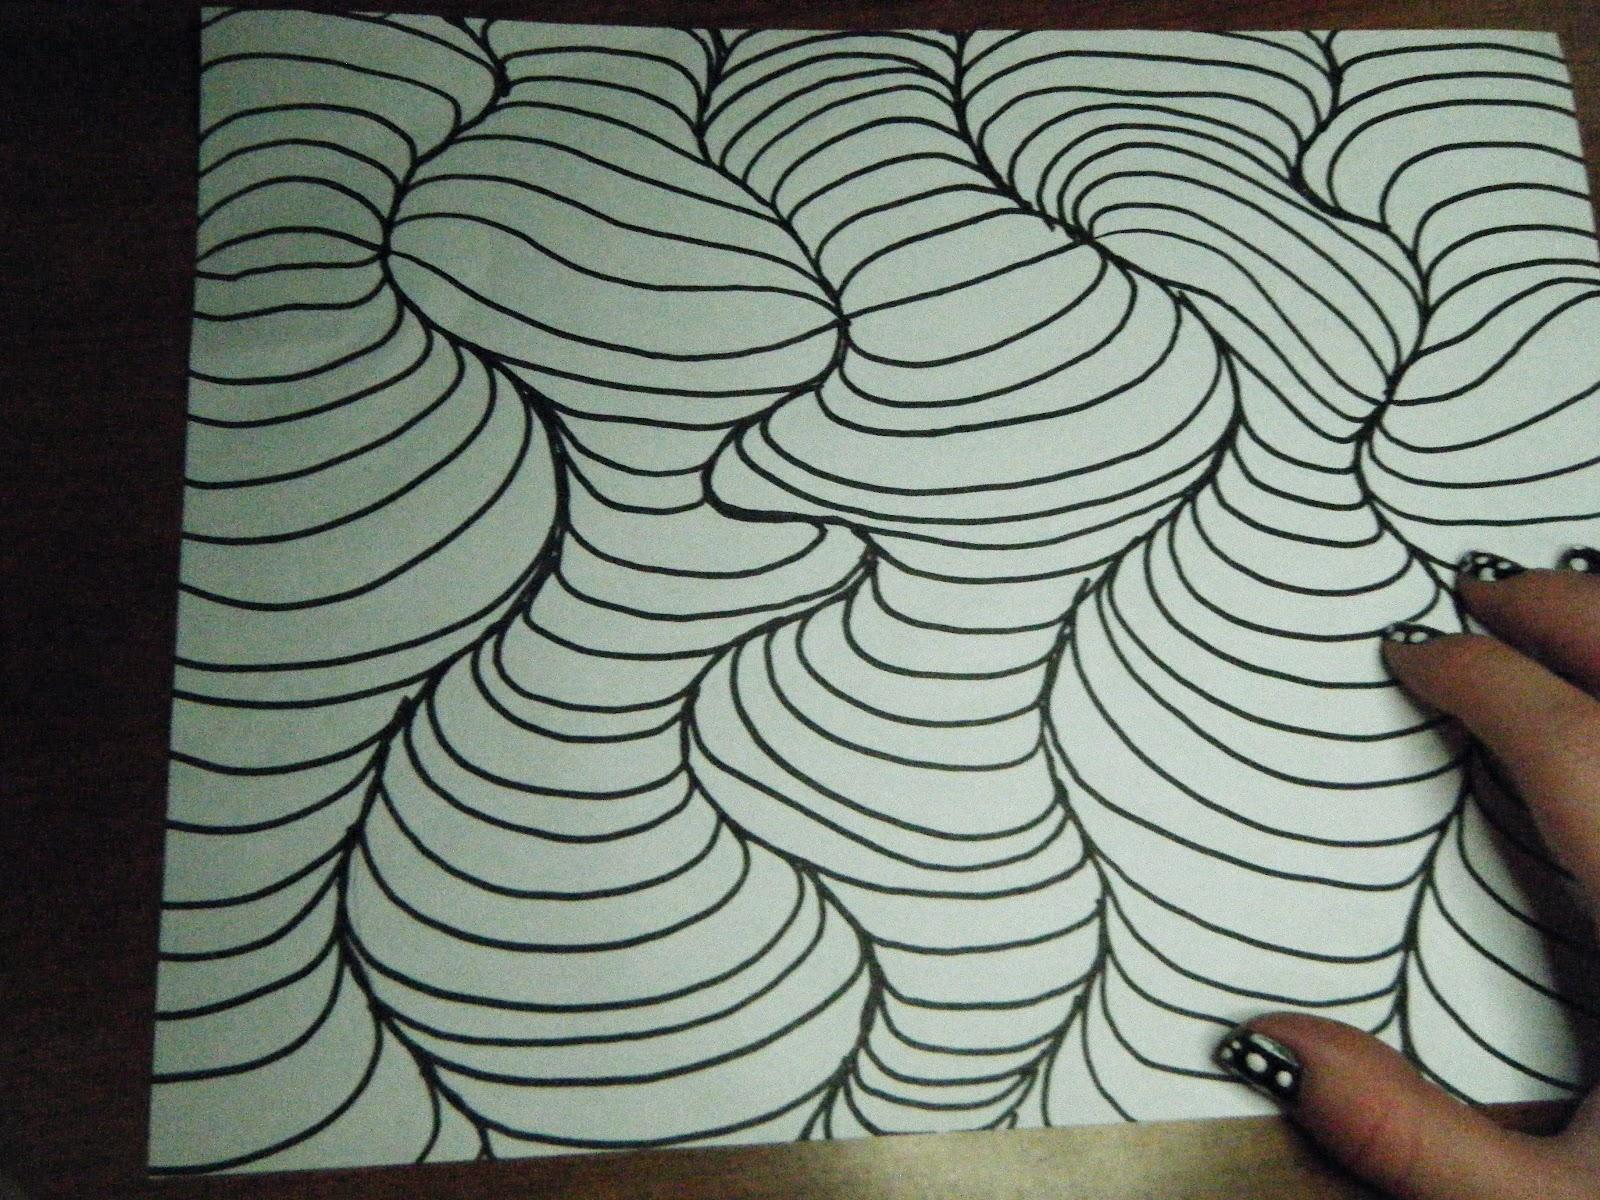 foto de Artes Visuales: Dibujo Psicodélico